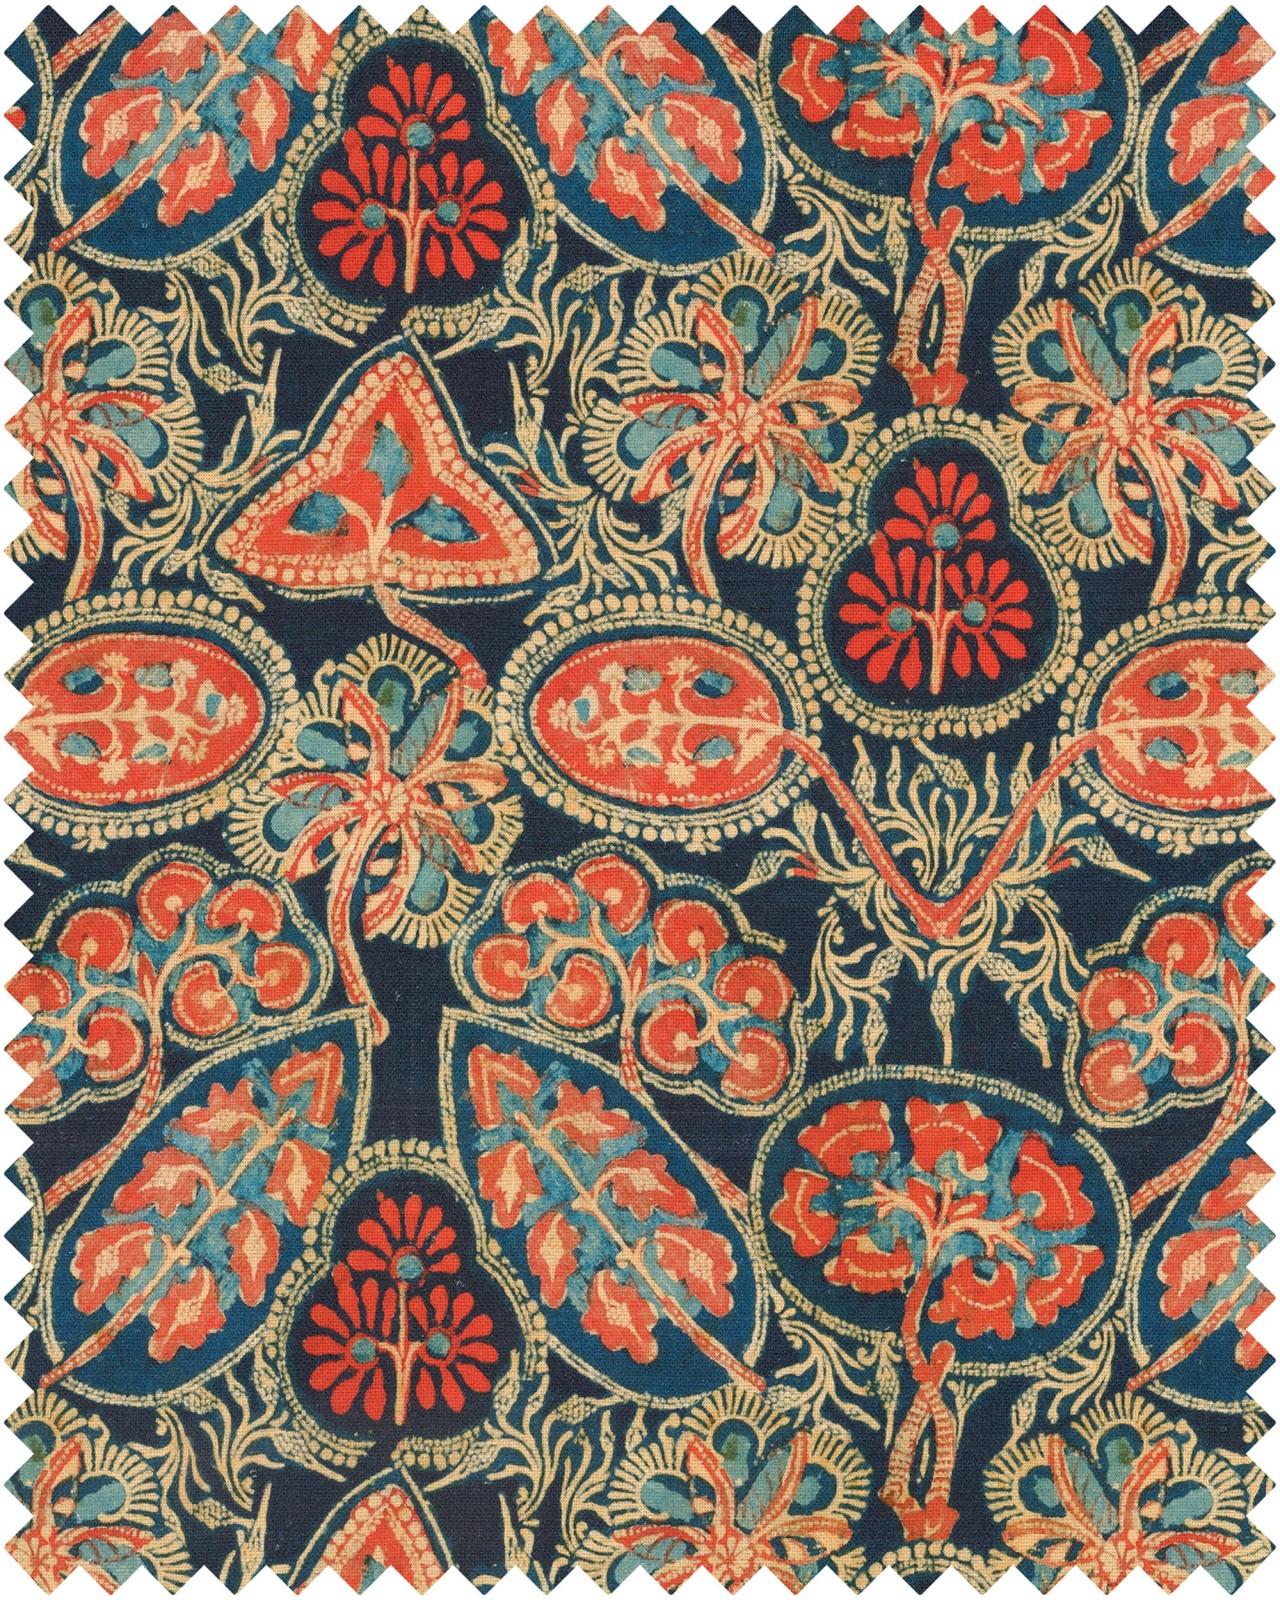 HEIRLOOM Linen Sample